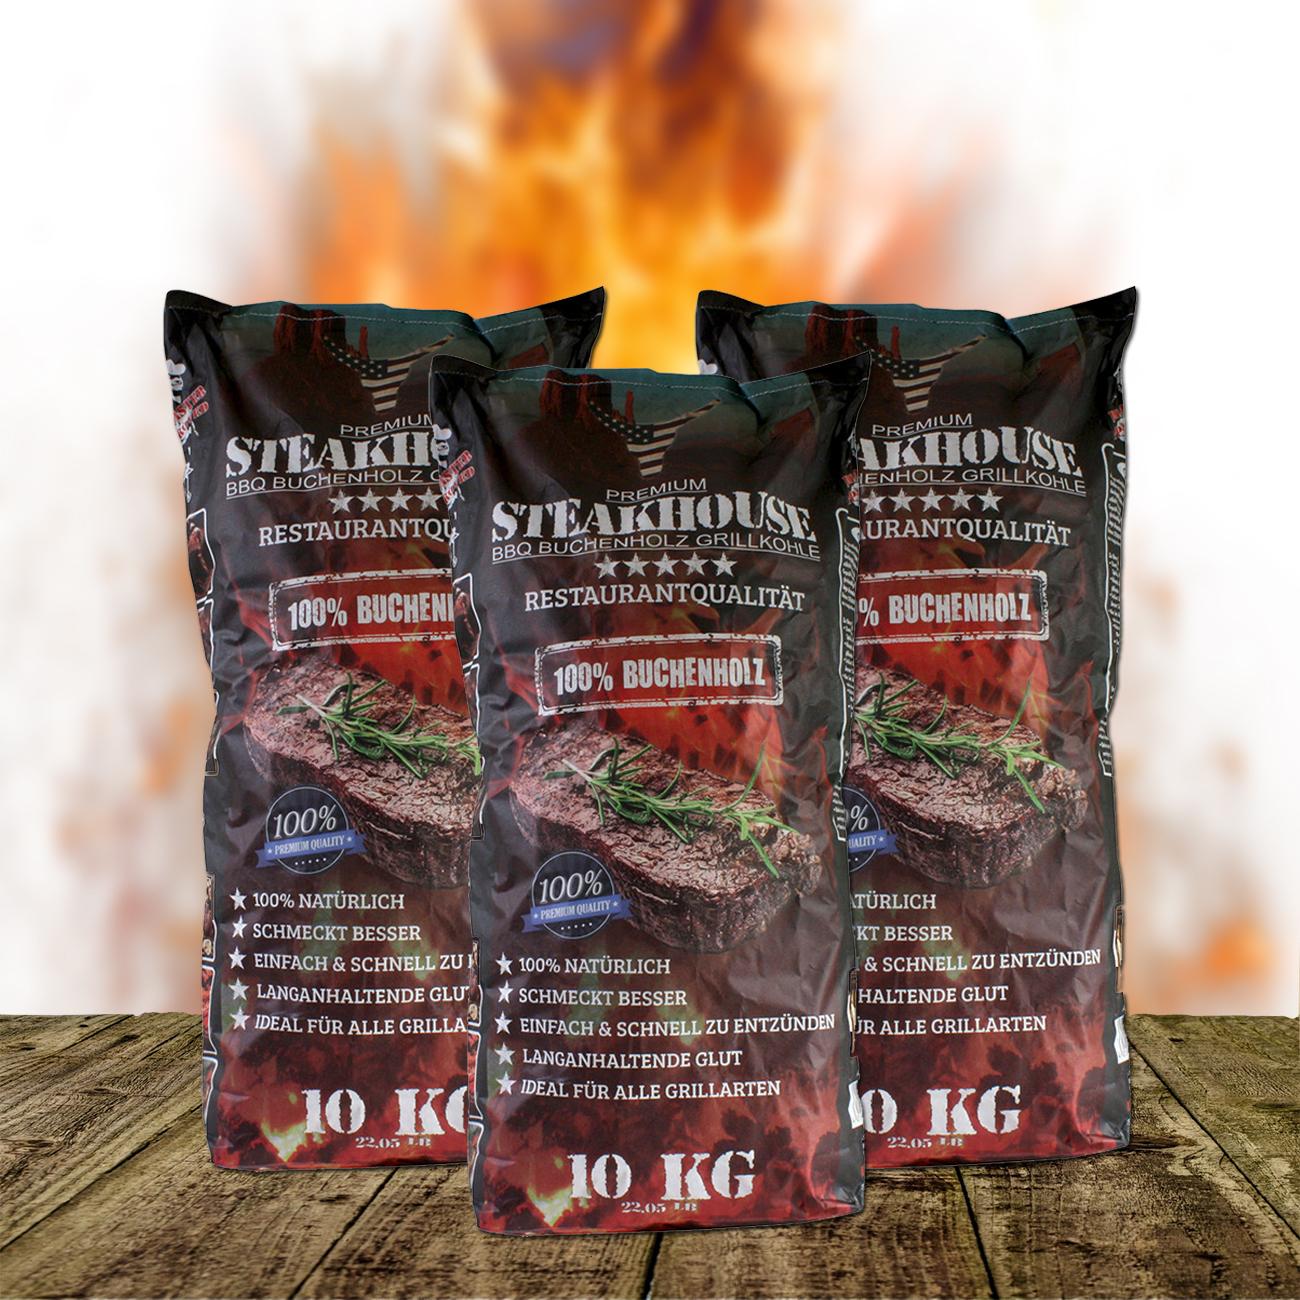 STABILO Steakhouse Premium Grillkohle aus Buche (10, 20, 30, 40, 50 o. 60 kg) 3x262902